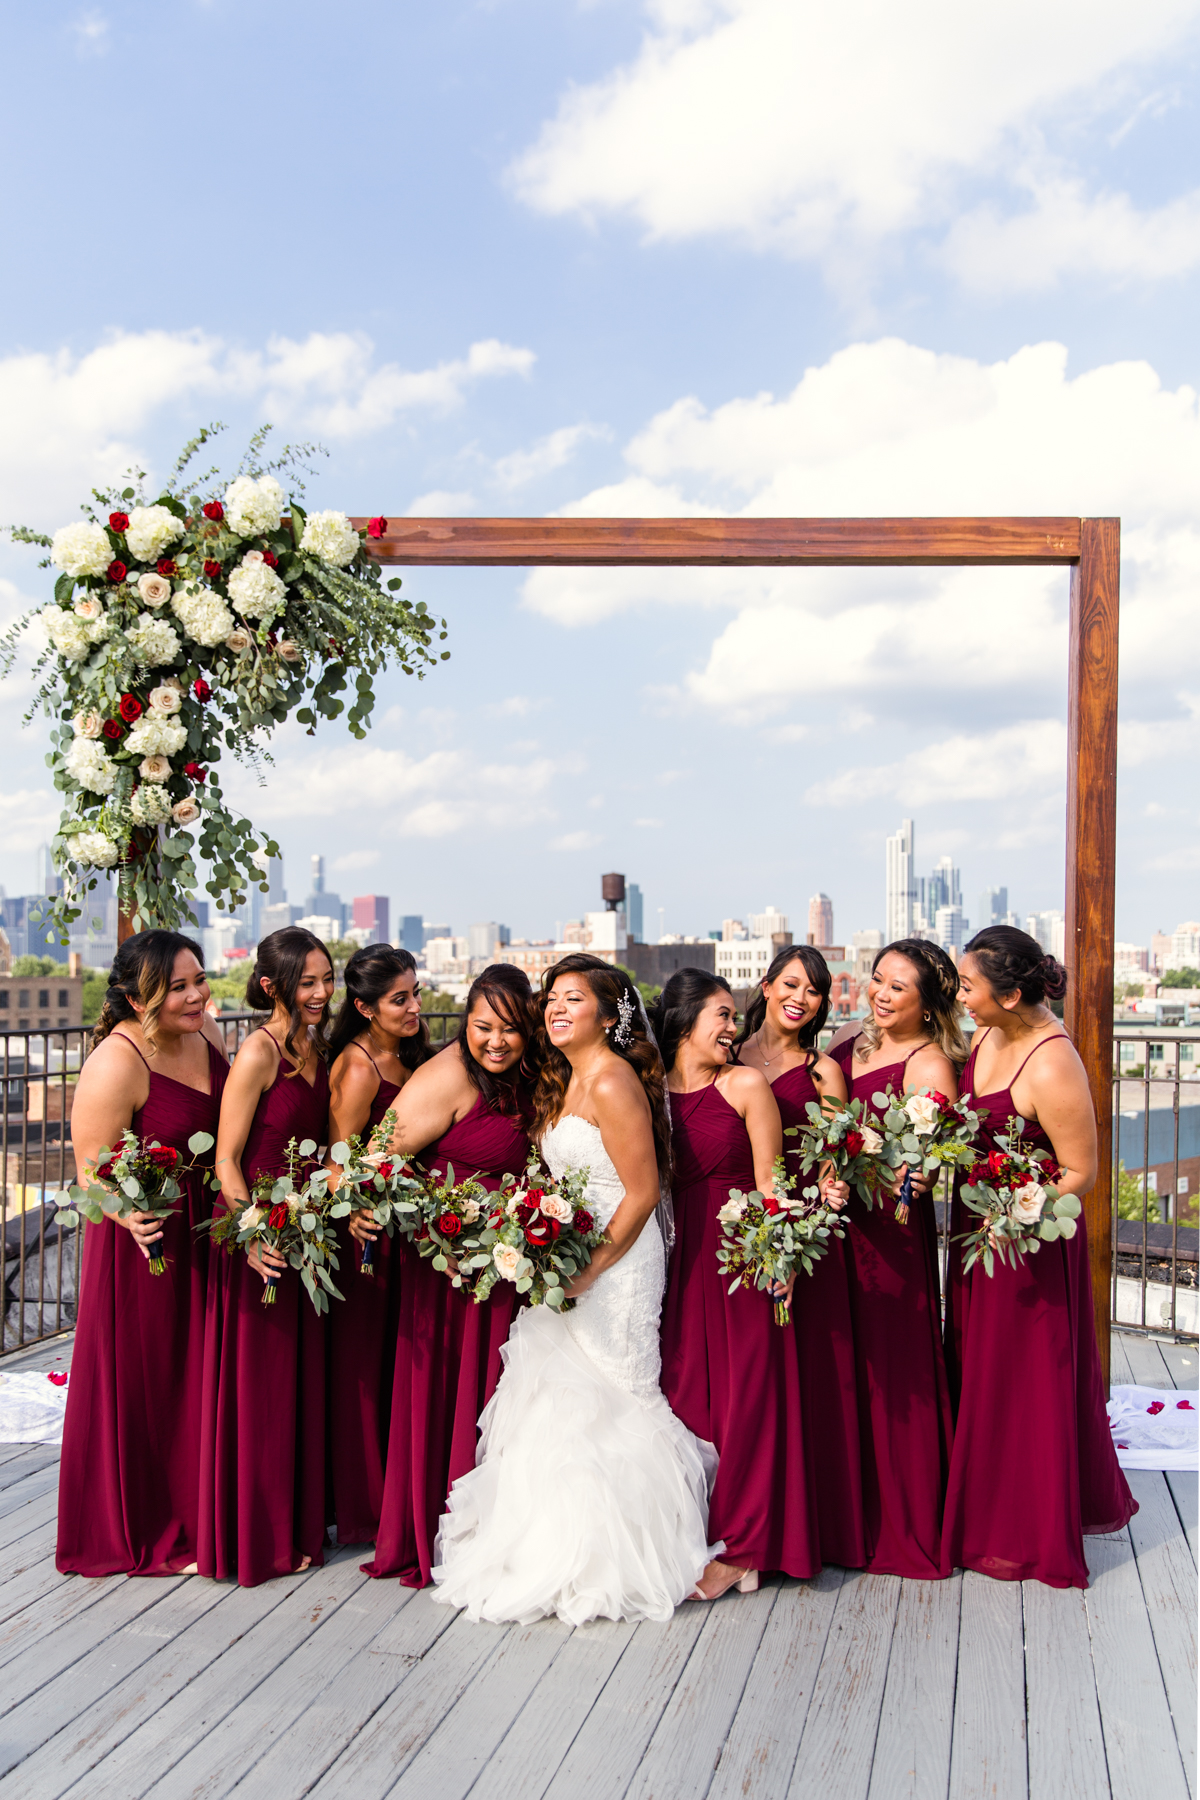 Lacuna-Lofts-wedding-by-Emma-Mullins-Photography-1